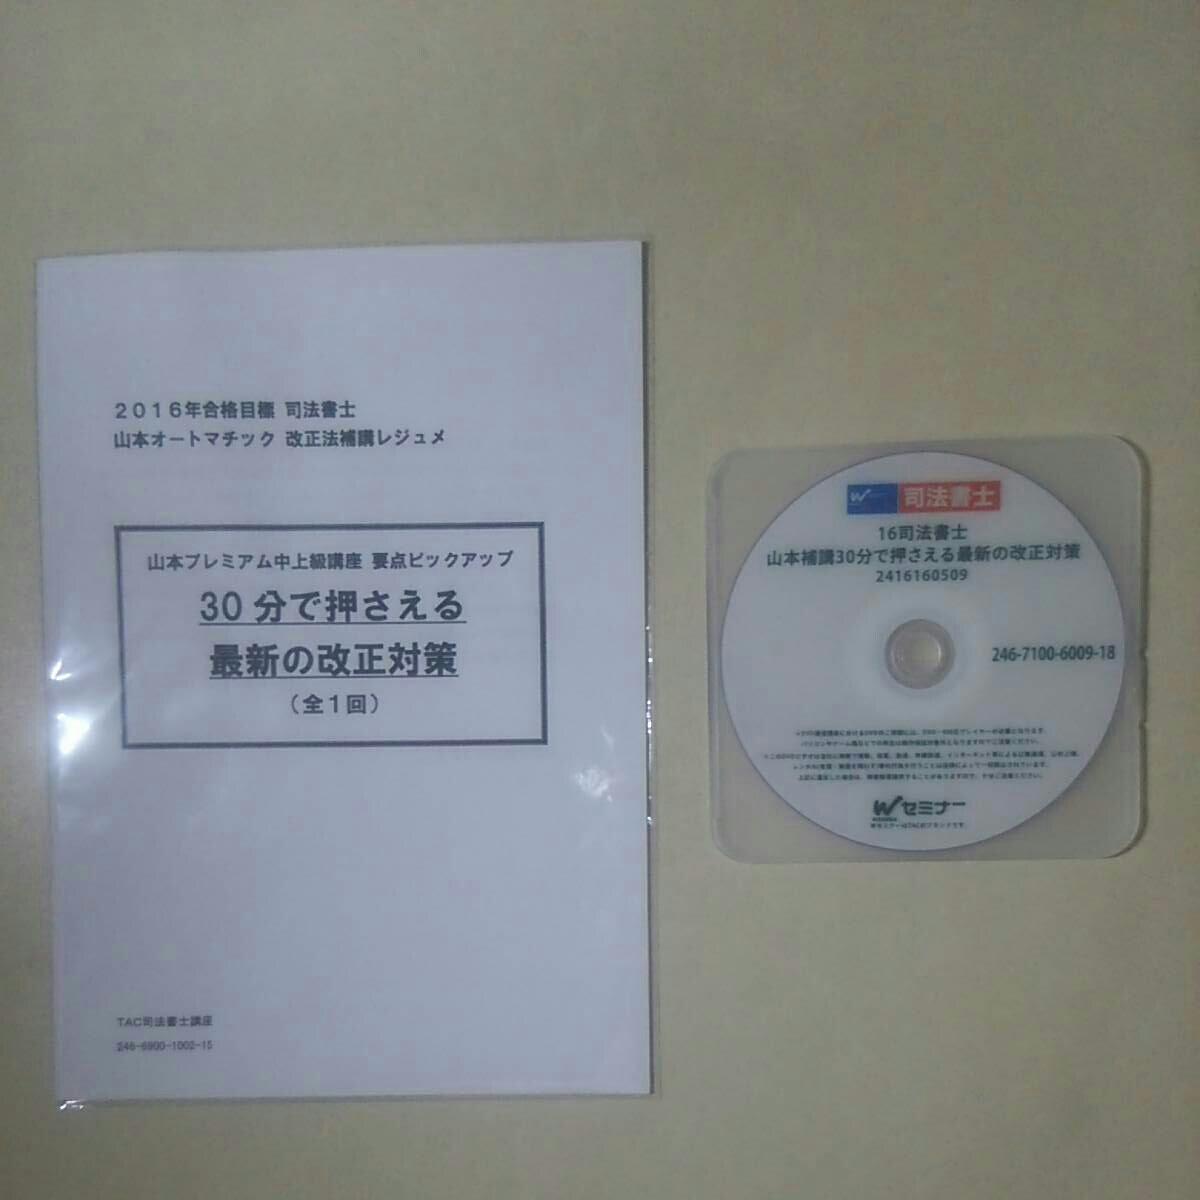 16年合格目標 司法書士 Wセミナー DVD